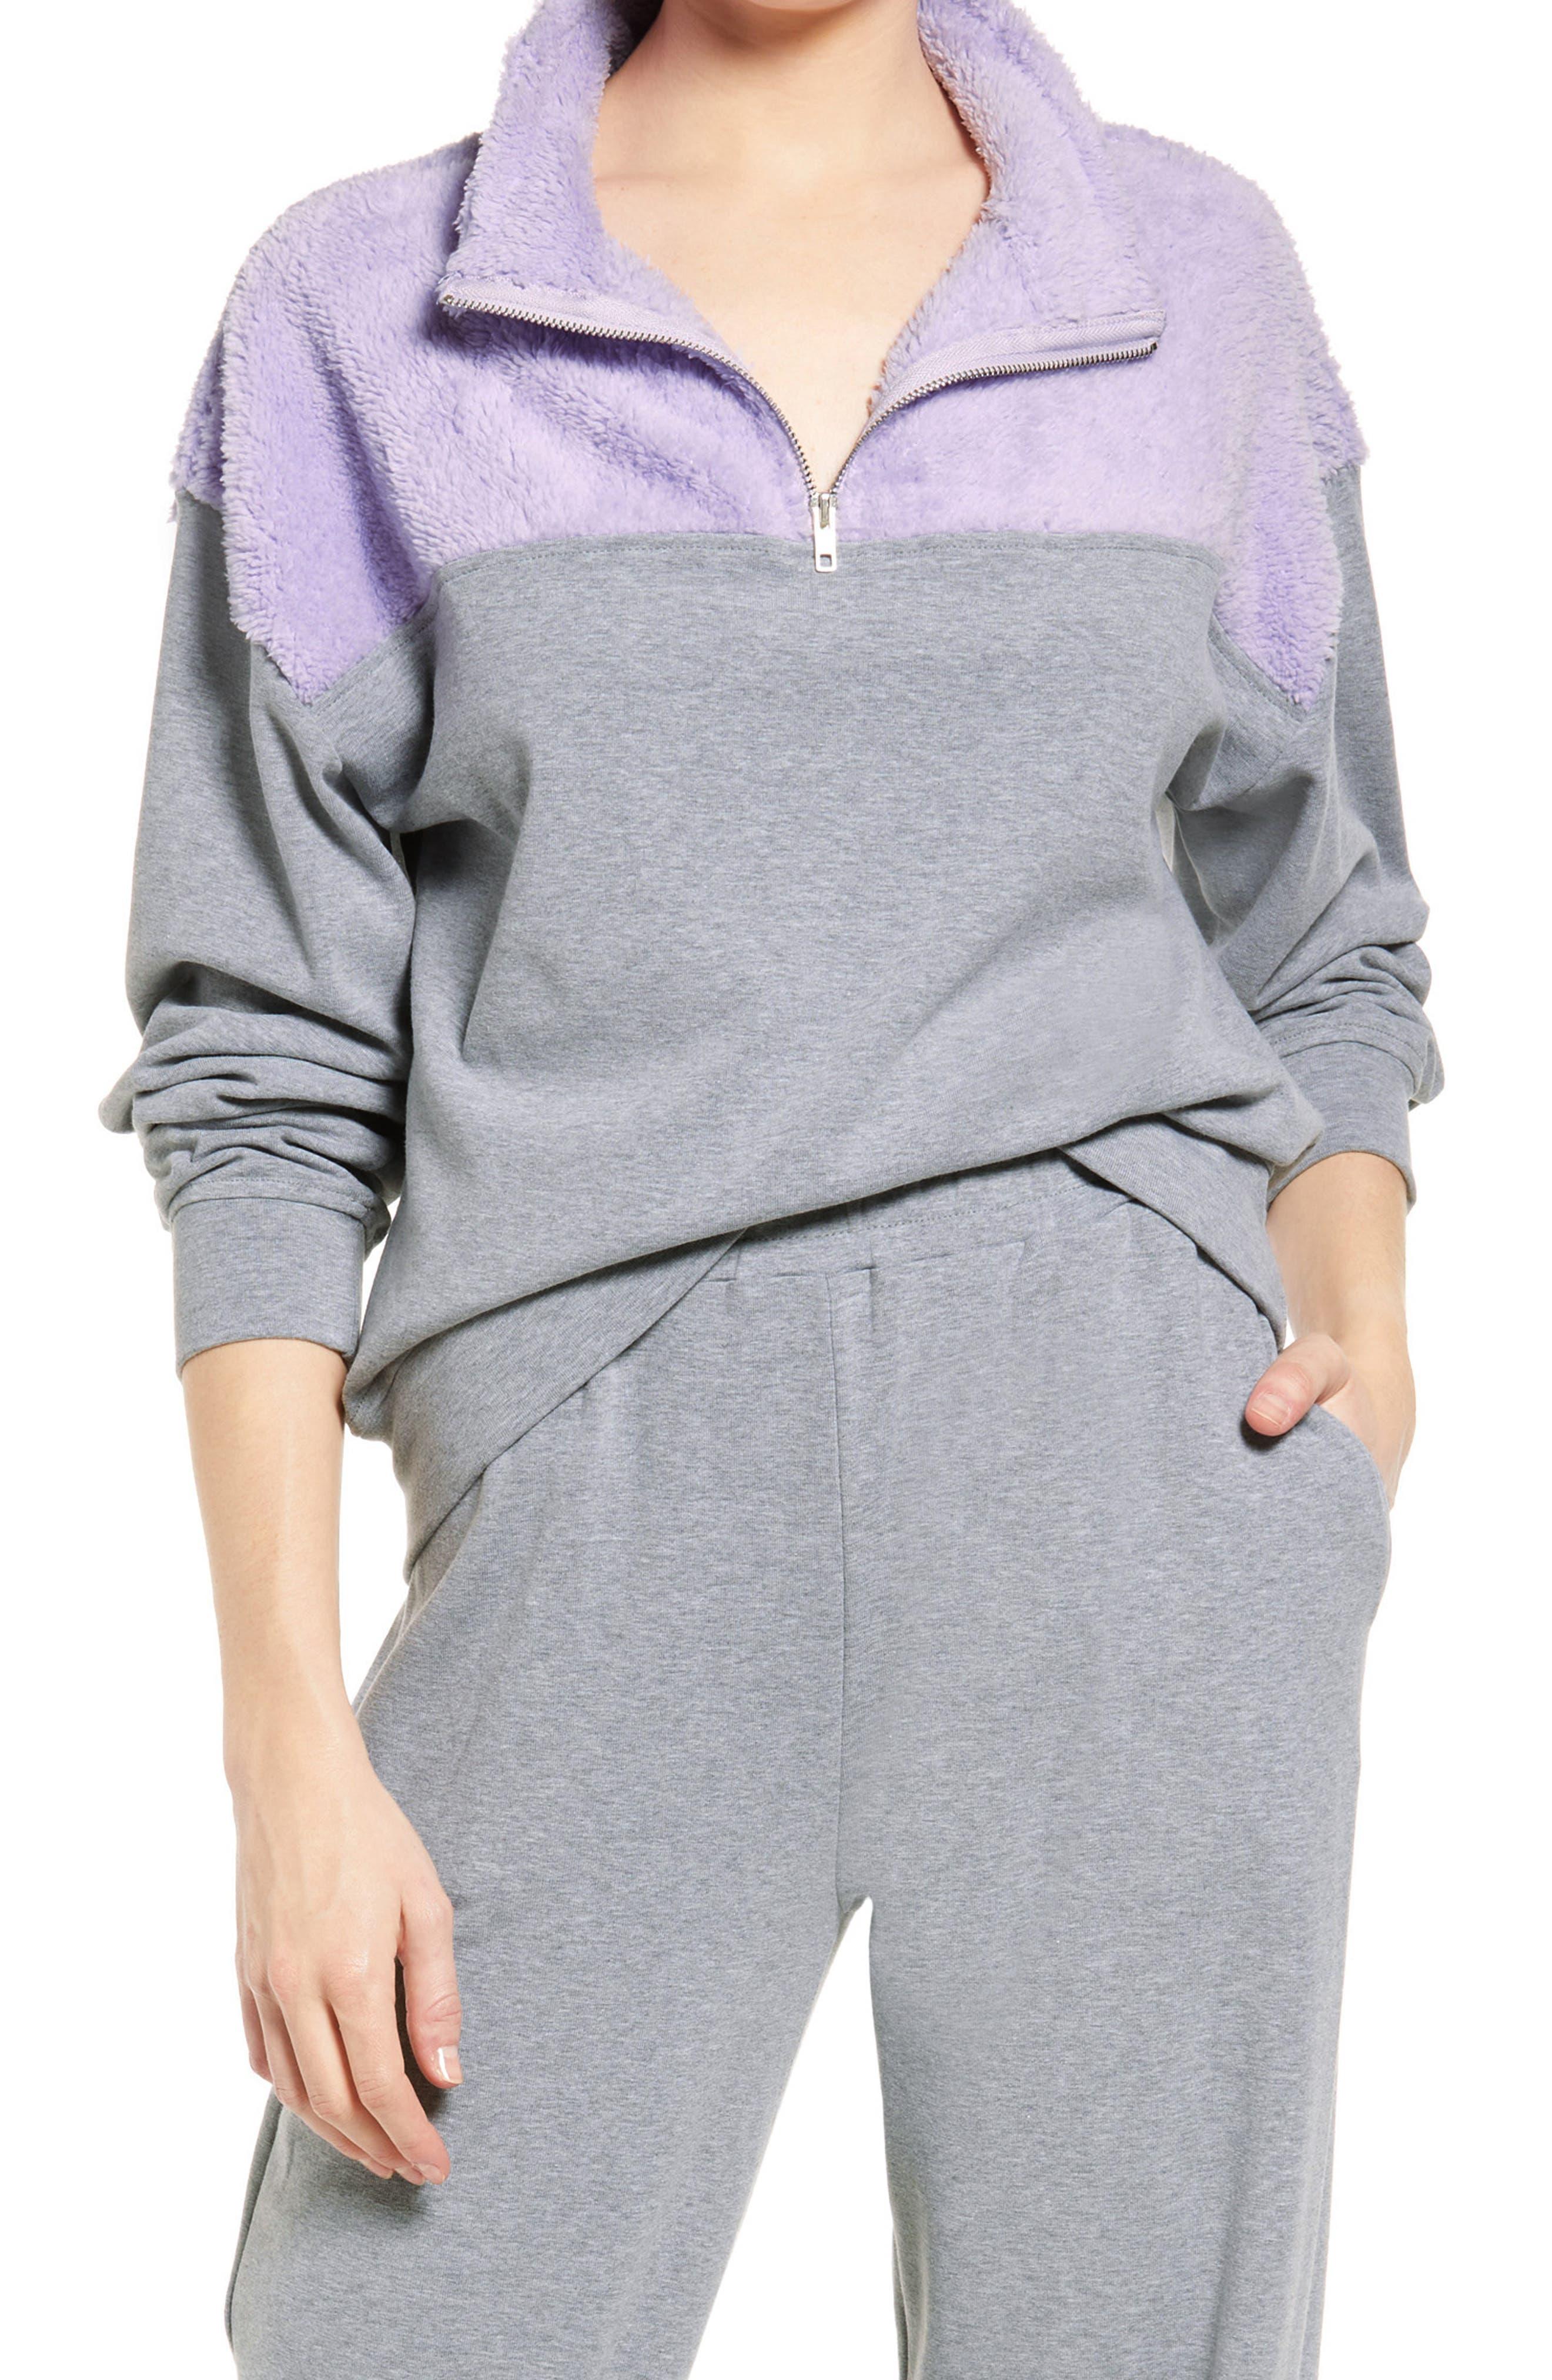 Women's Kendall + Kylie Quarter Zip Faux Fur Pullover